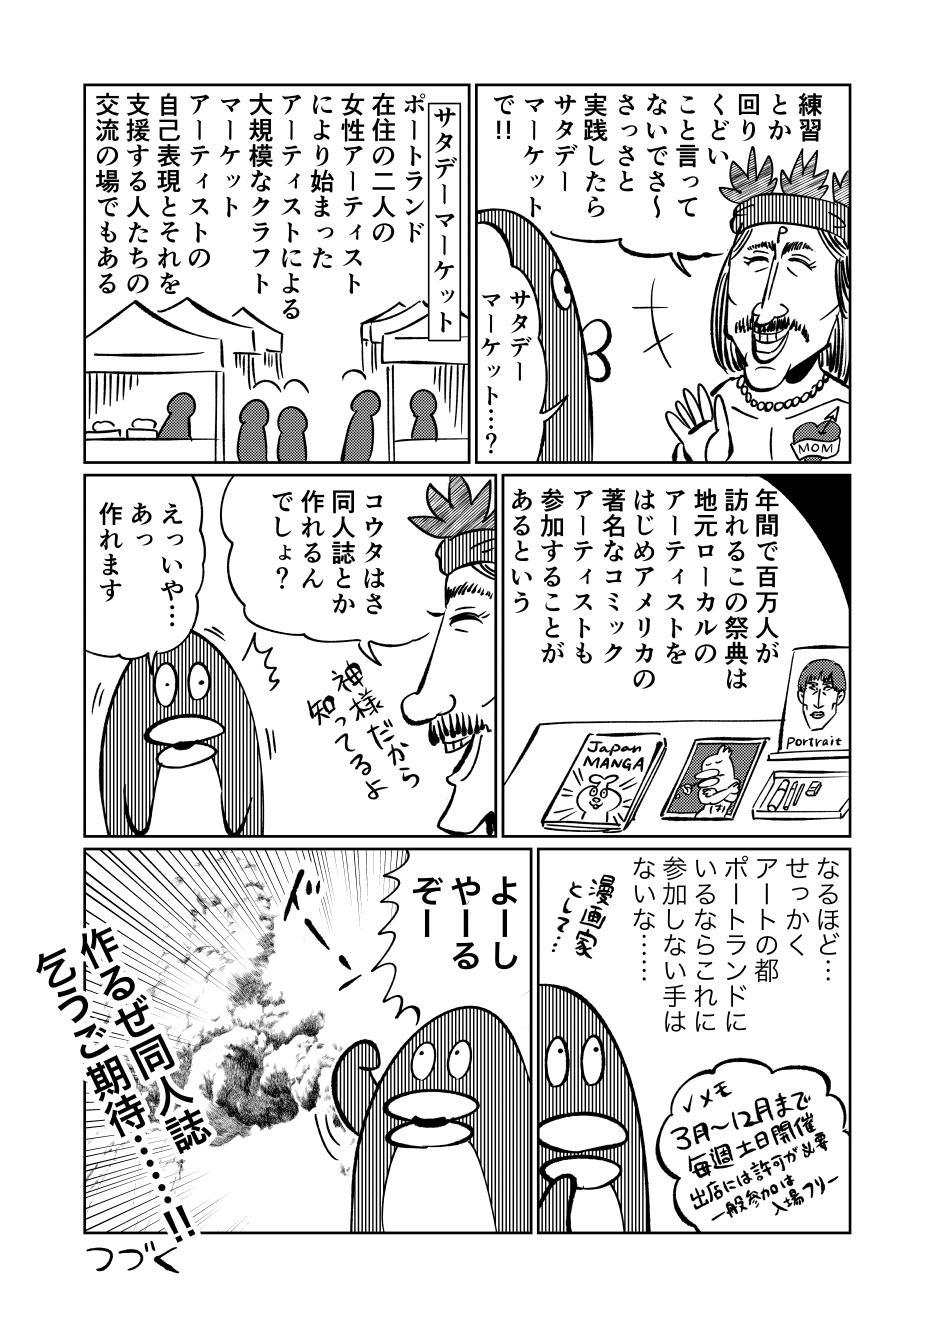 https://www.ryugaku.co.jp/blog/els_portland/upload/1304.jpg